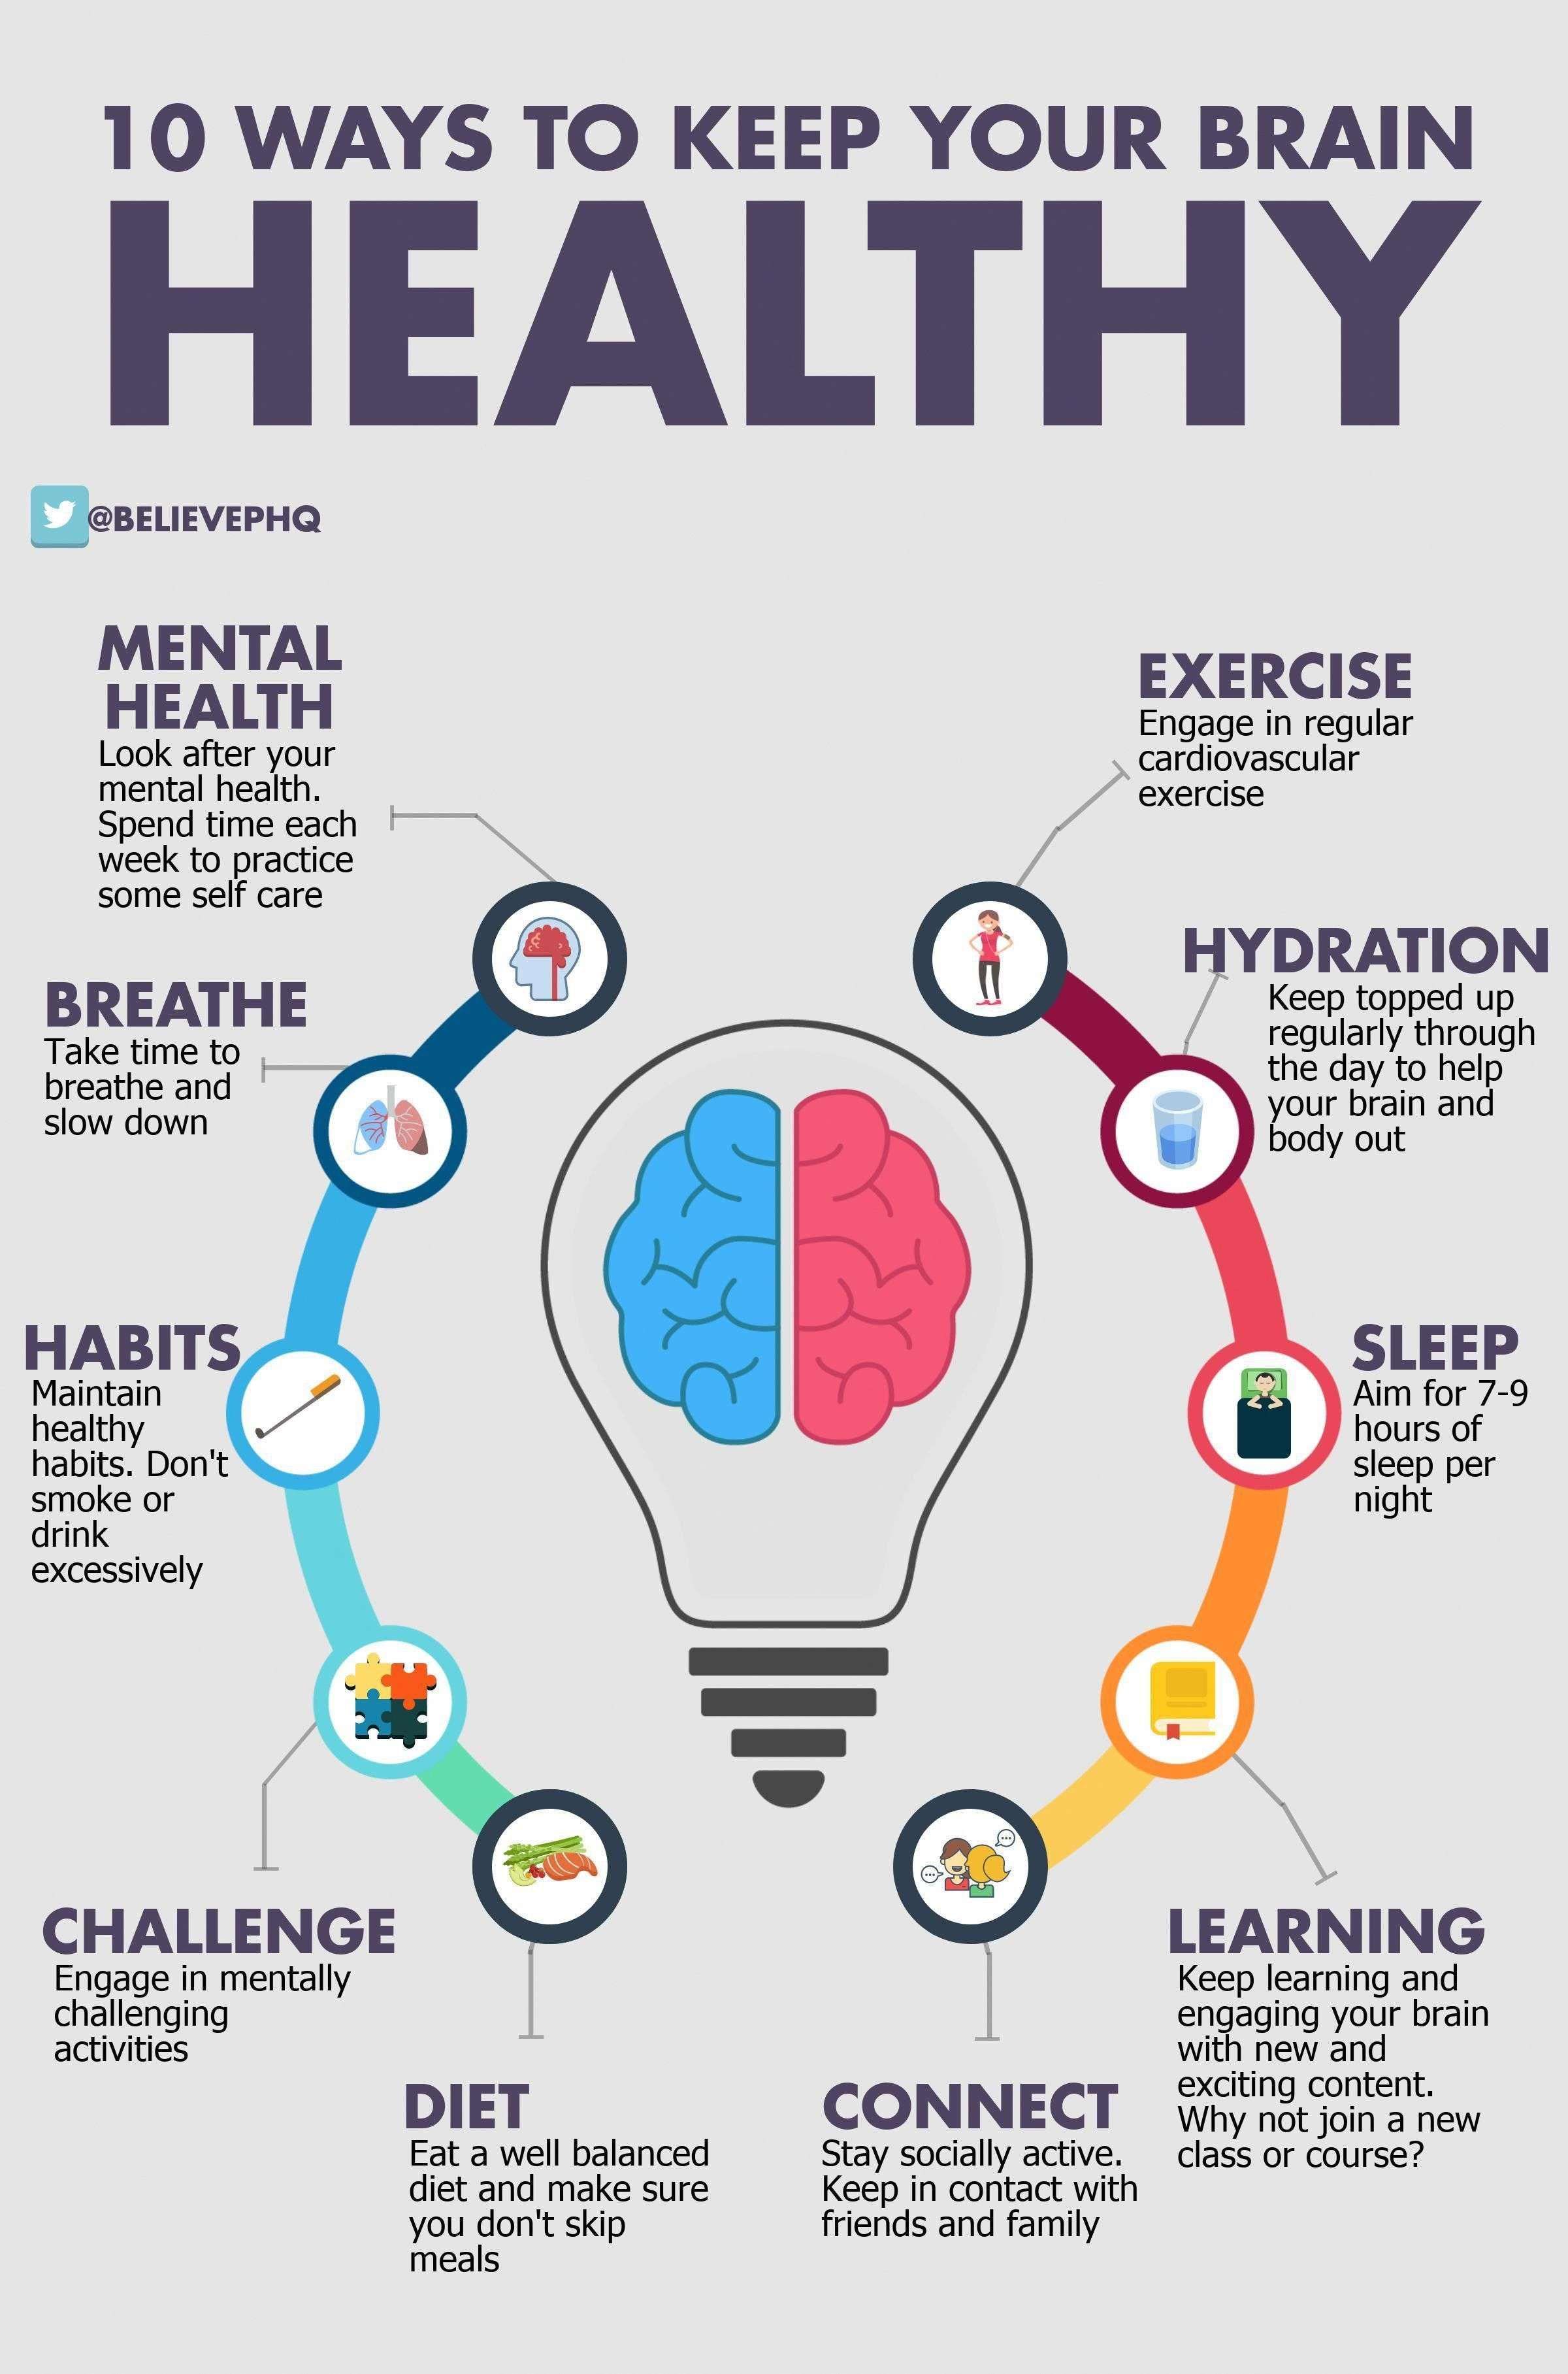 8 Fun Ways to Improve Your Brain